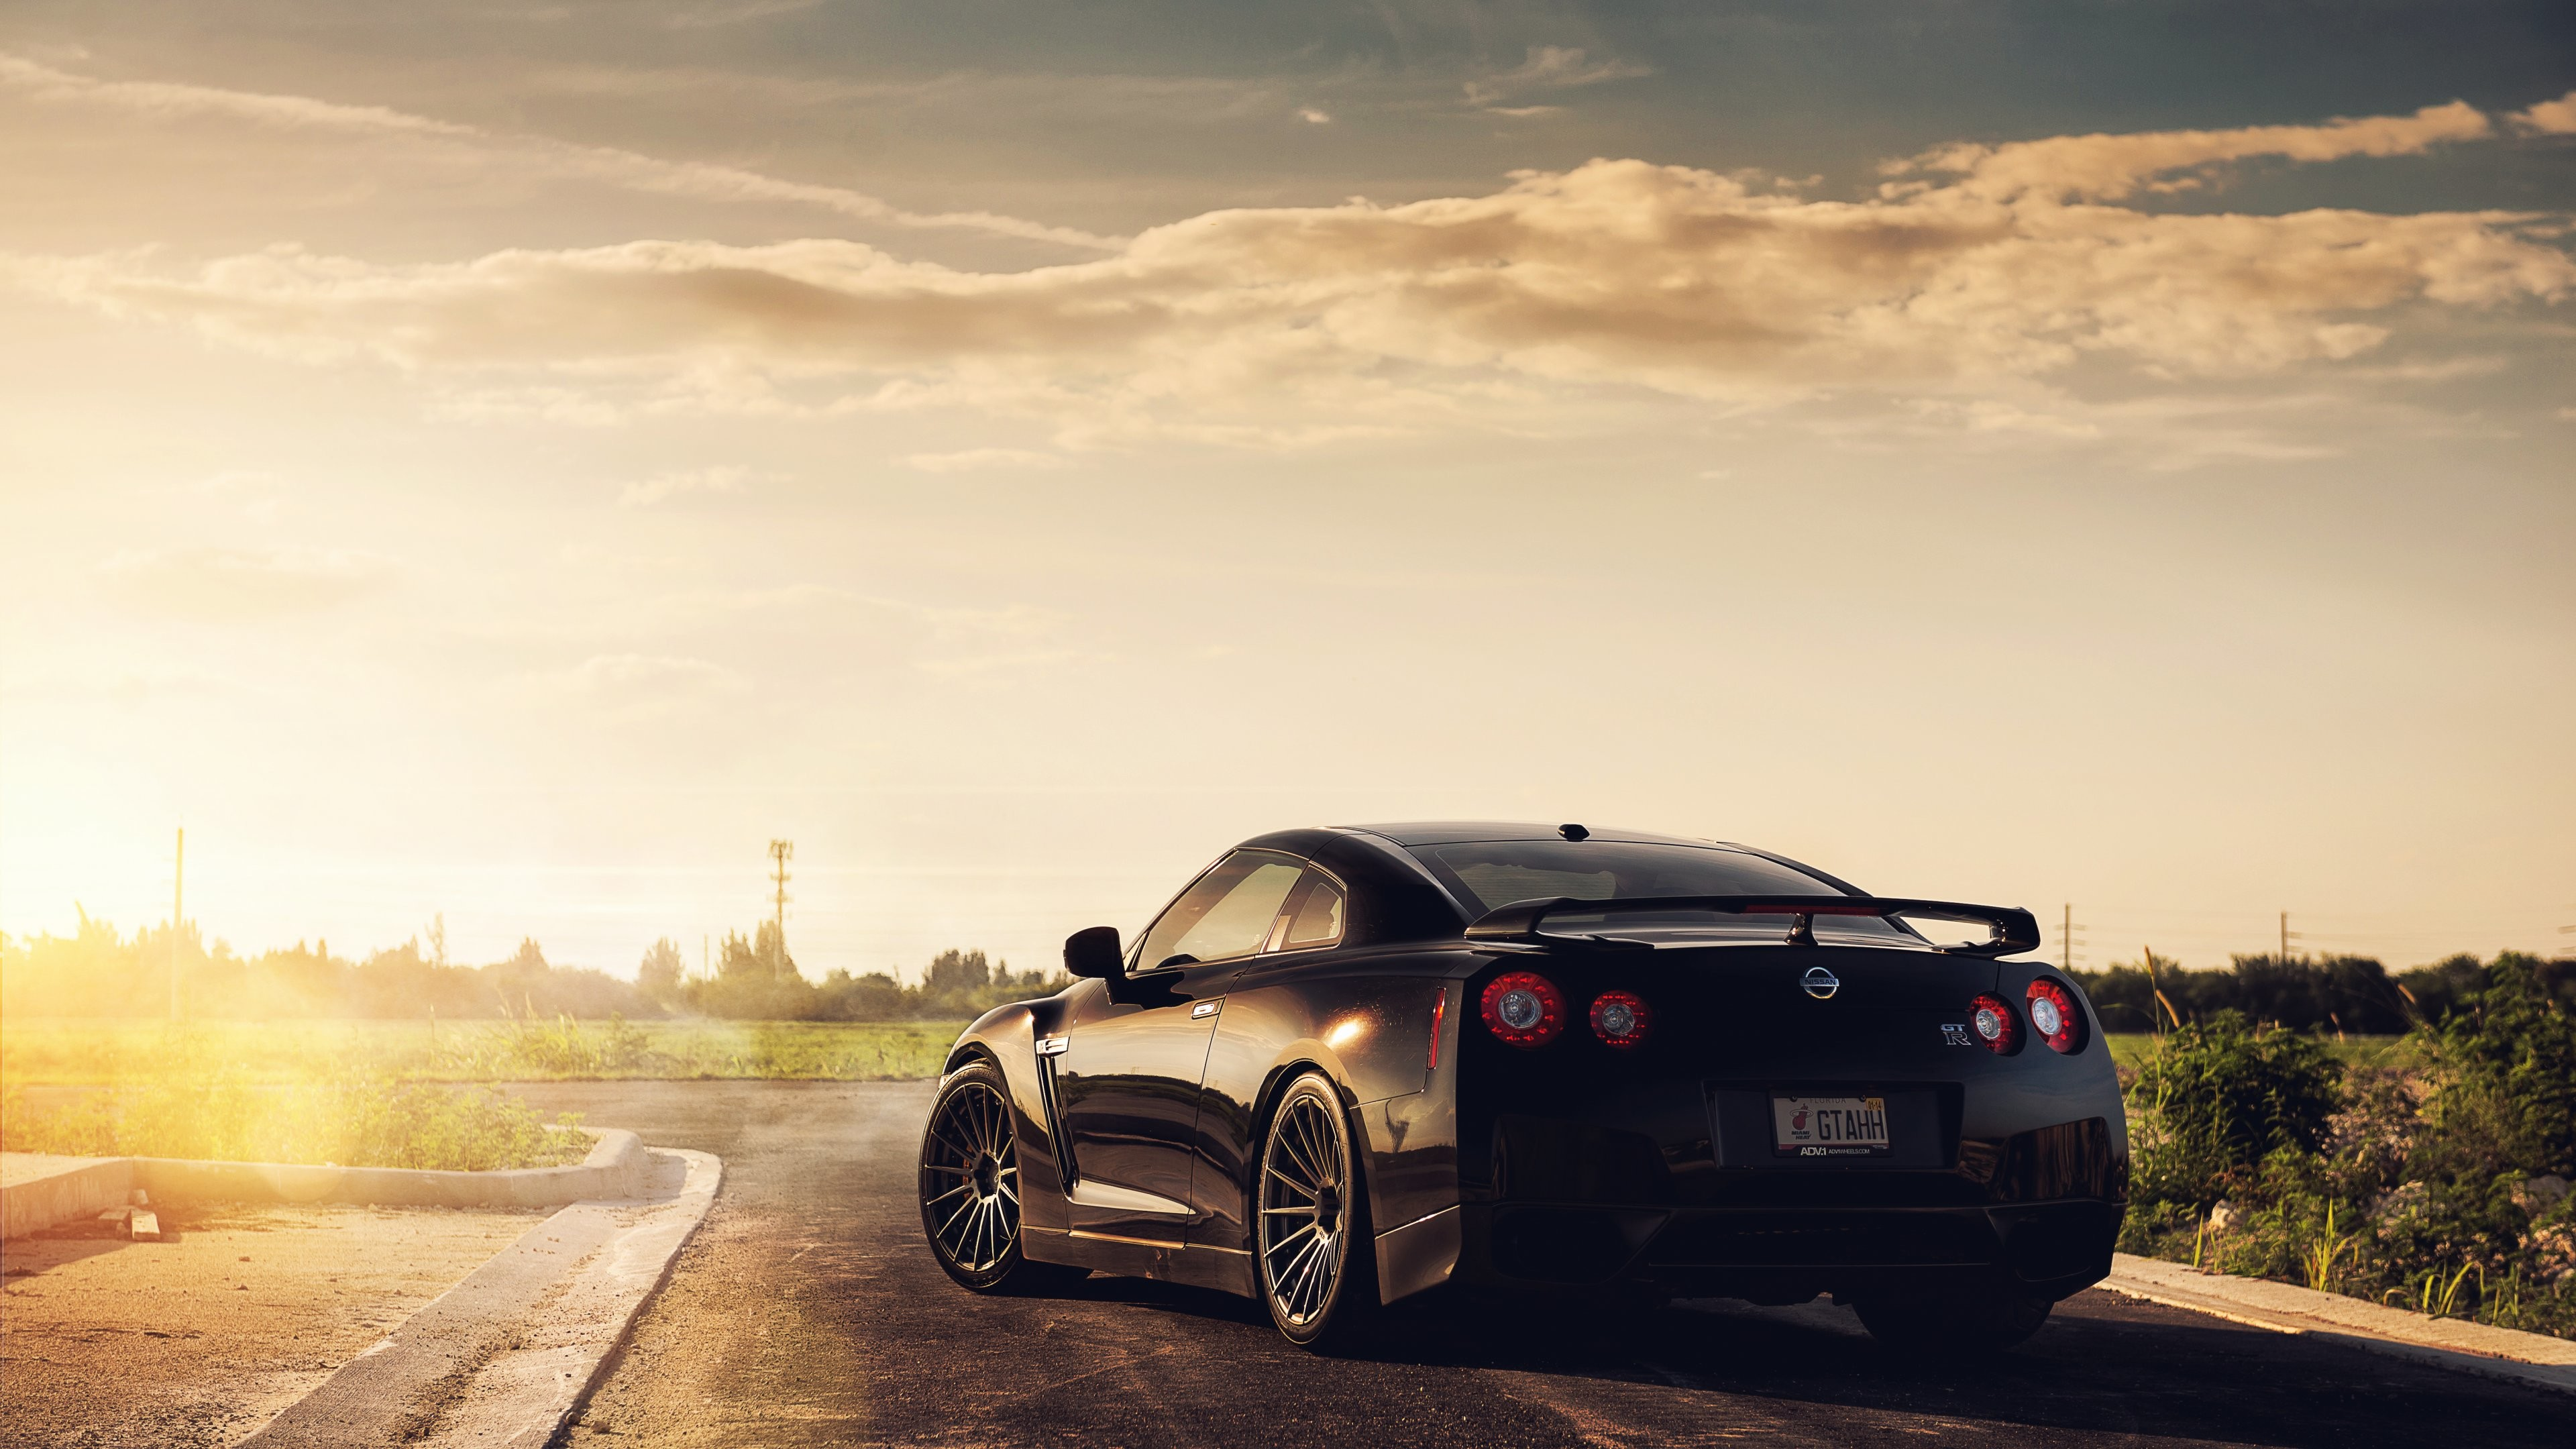 Res: 3840x2160, Nissan GTR